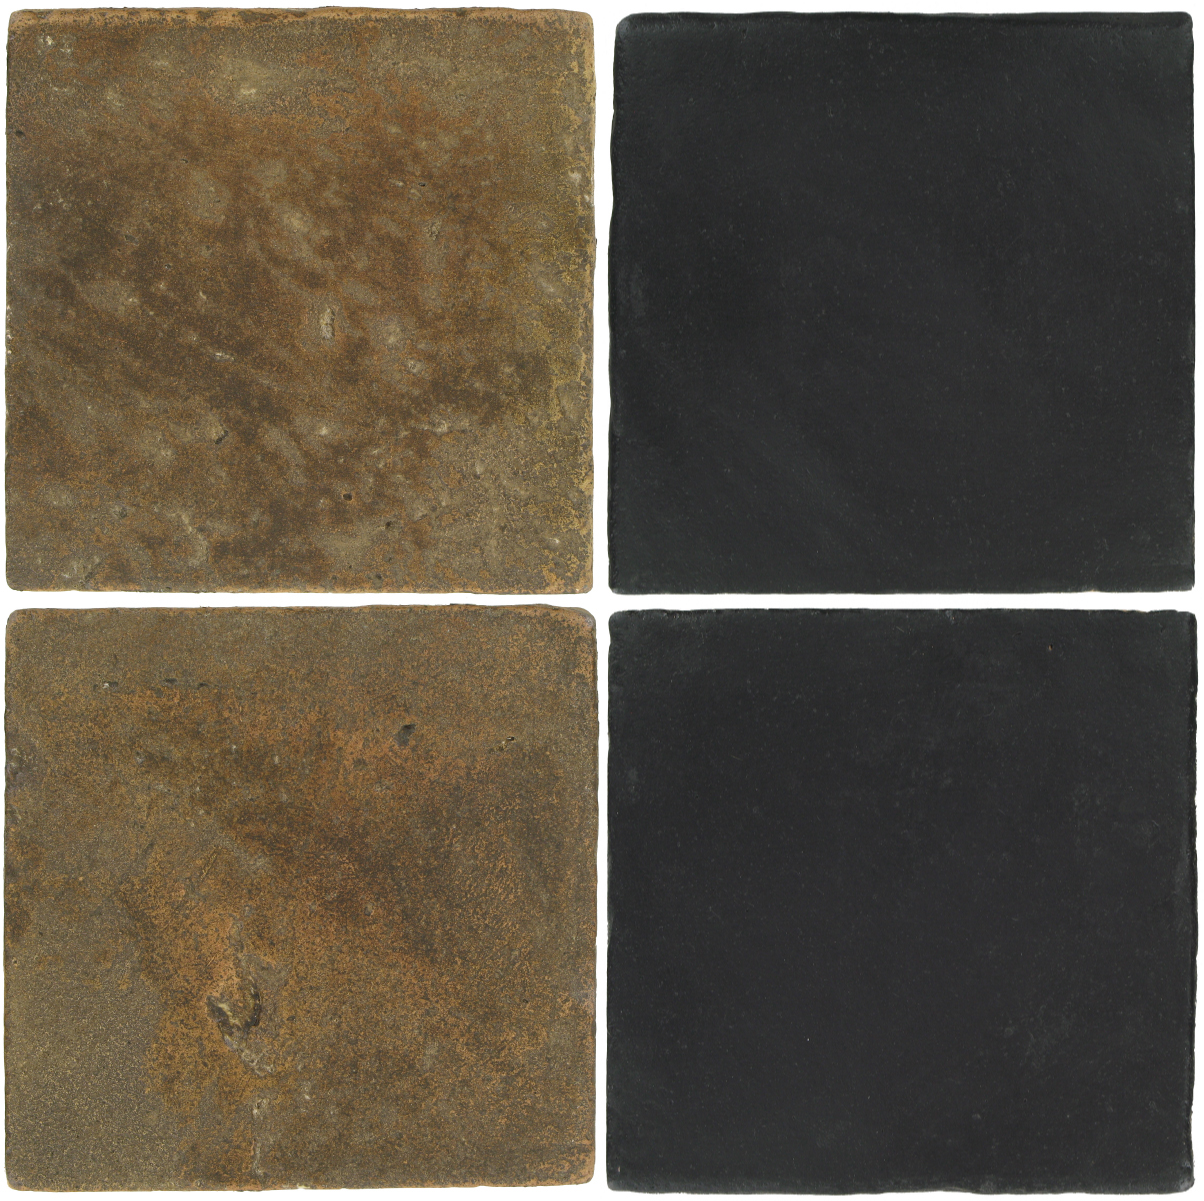 Pedralbes Antique Terracotta  2 Color Combinations  VTG-PSVN Verona Brown + OHS-PGCB Carbon Black